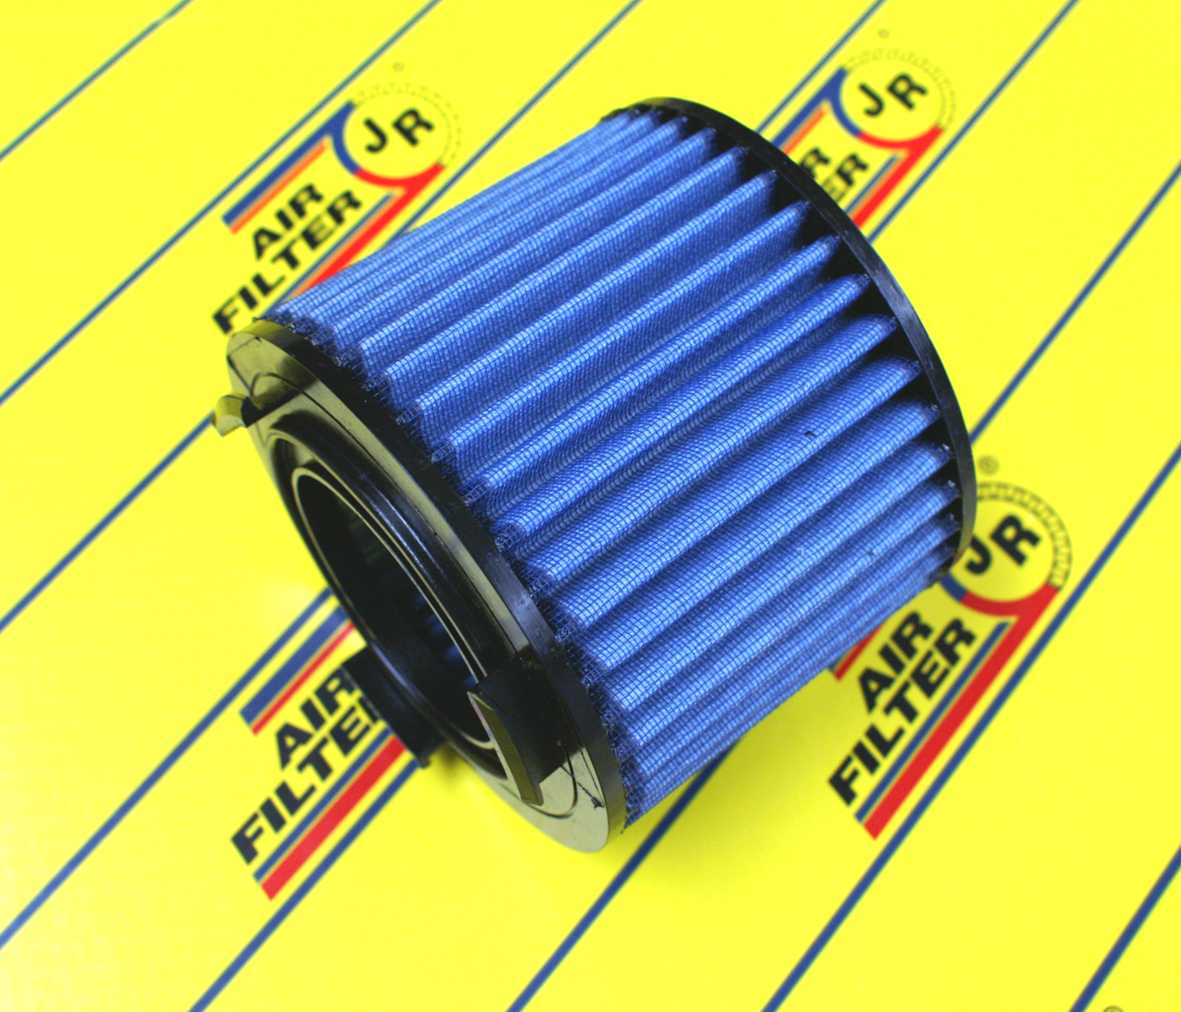 Sportovní vzduchový filtr T 73110 SKODA Fabia II 3/10-> 1,2L TSI